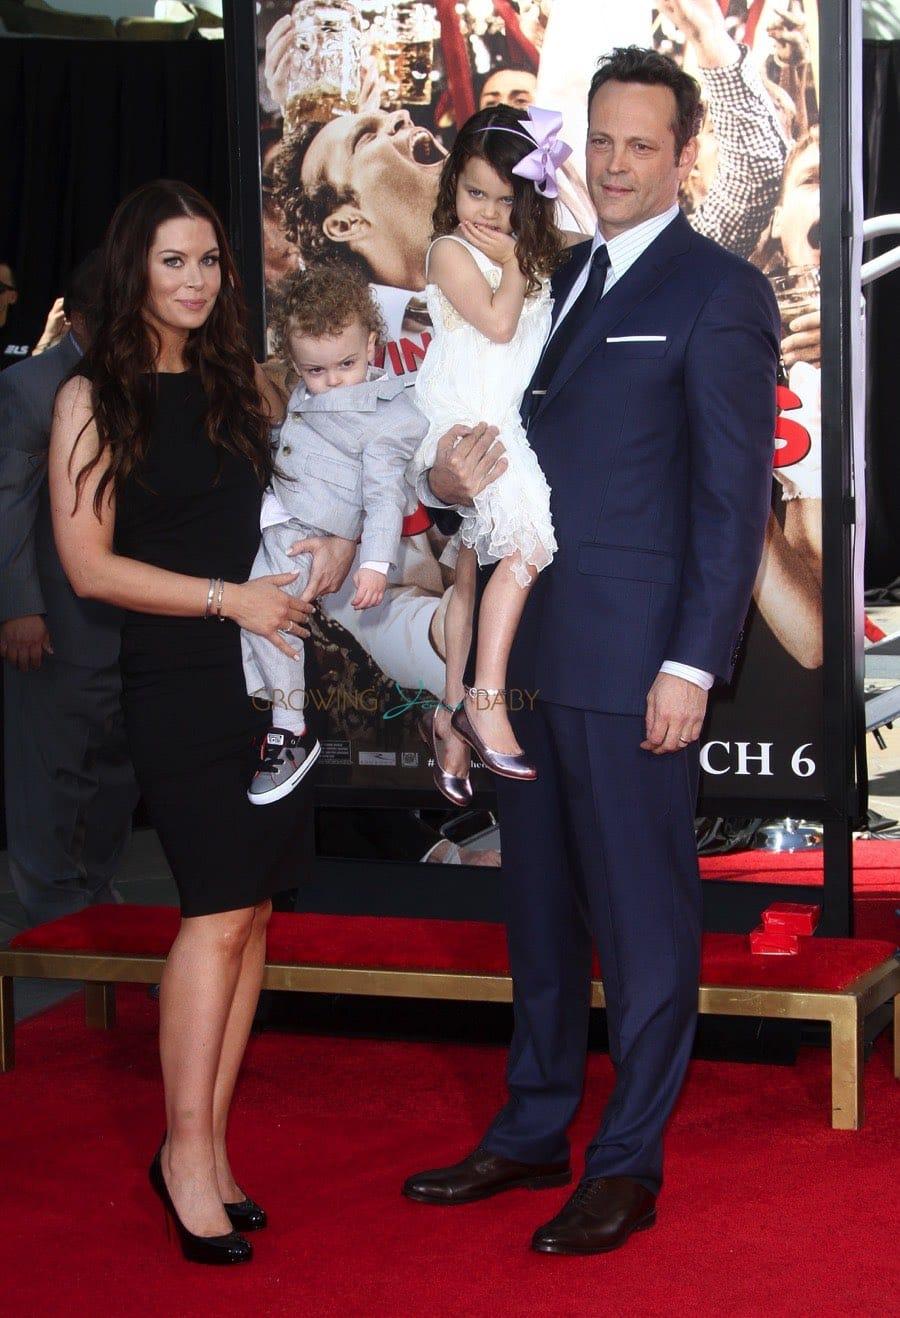 Vince Vaughn Kyla Weber >> Kyla Weber And Vince Vaughn With Kids Lochlyn Vernon At